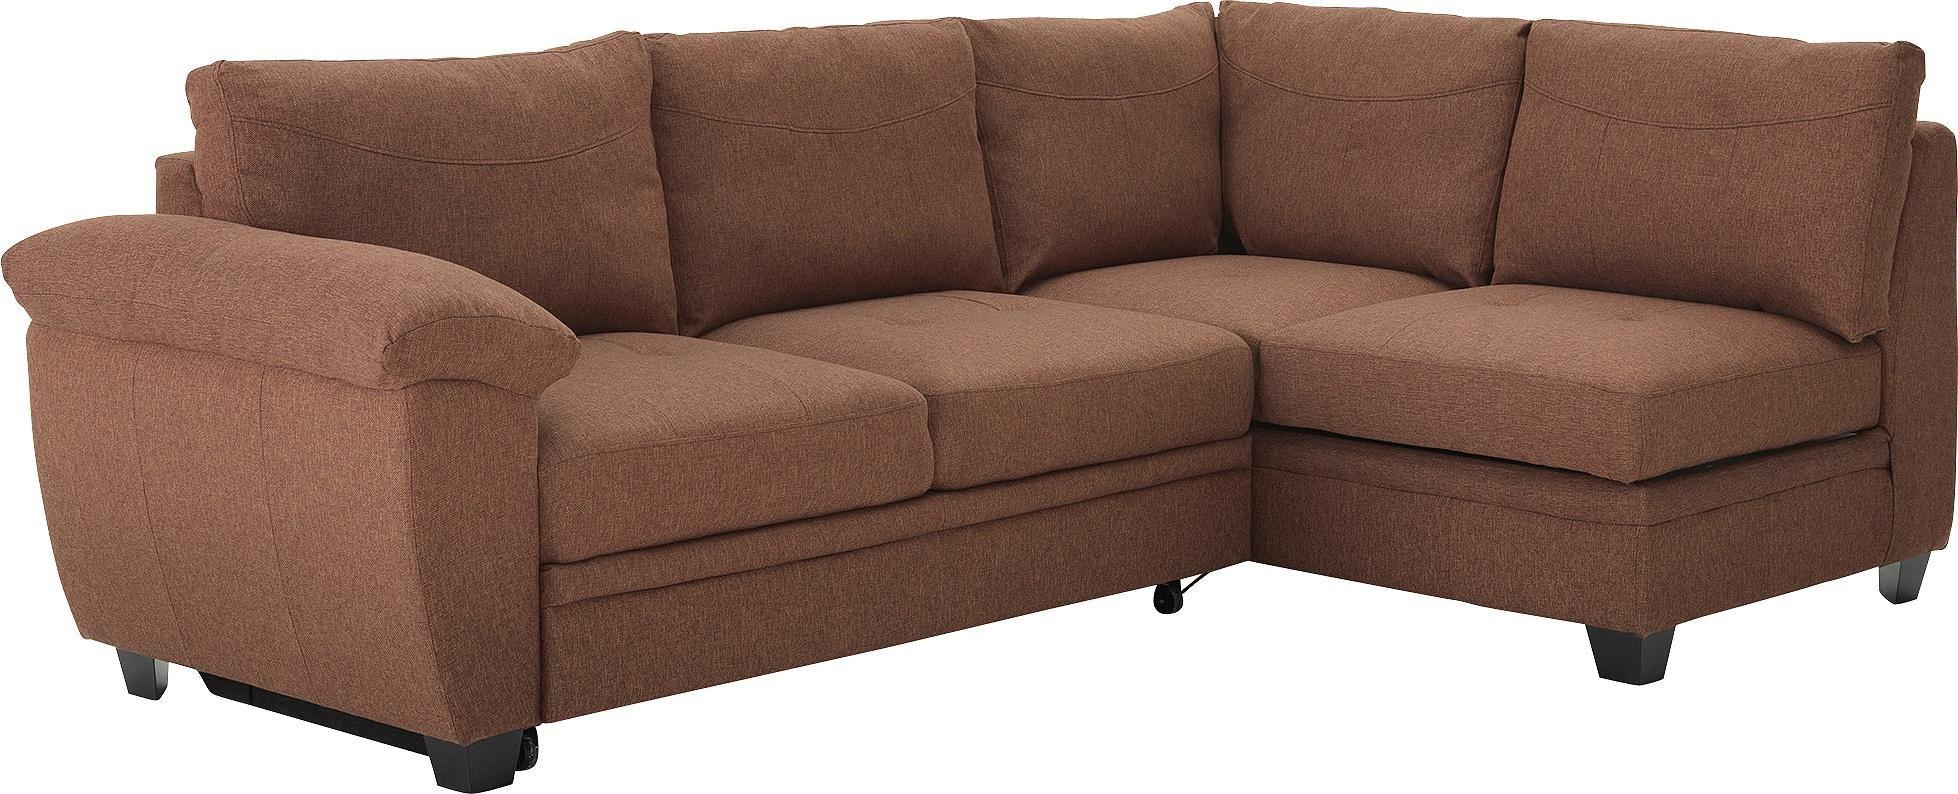 Argos Home - Fernando Fabric Right Corner - Sofa Bed - Chocolate